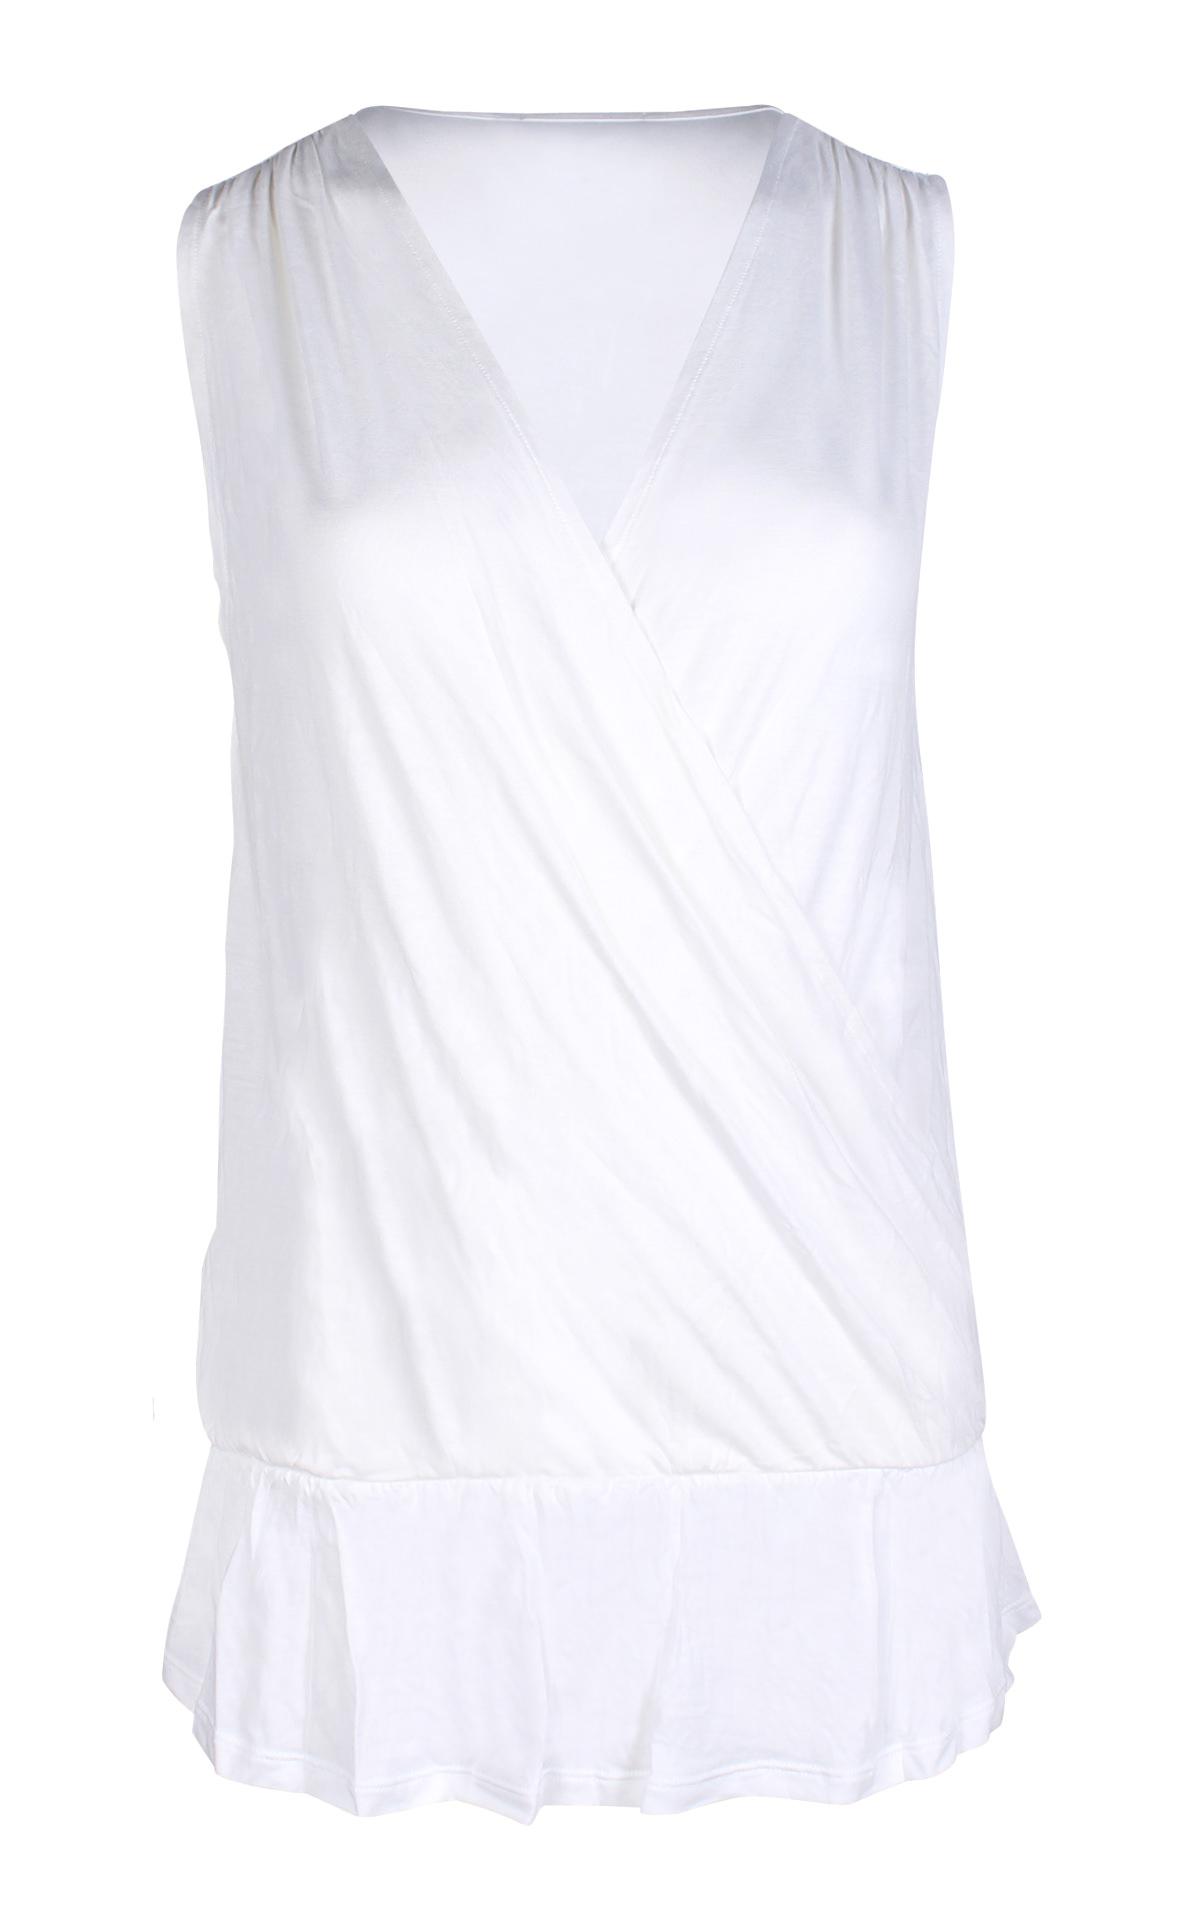 5d9c5b8853f6 Γυναίκα Outwear   BeachWear Top Μπλούζα Κρουαζέ Viscose Outwear